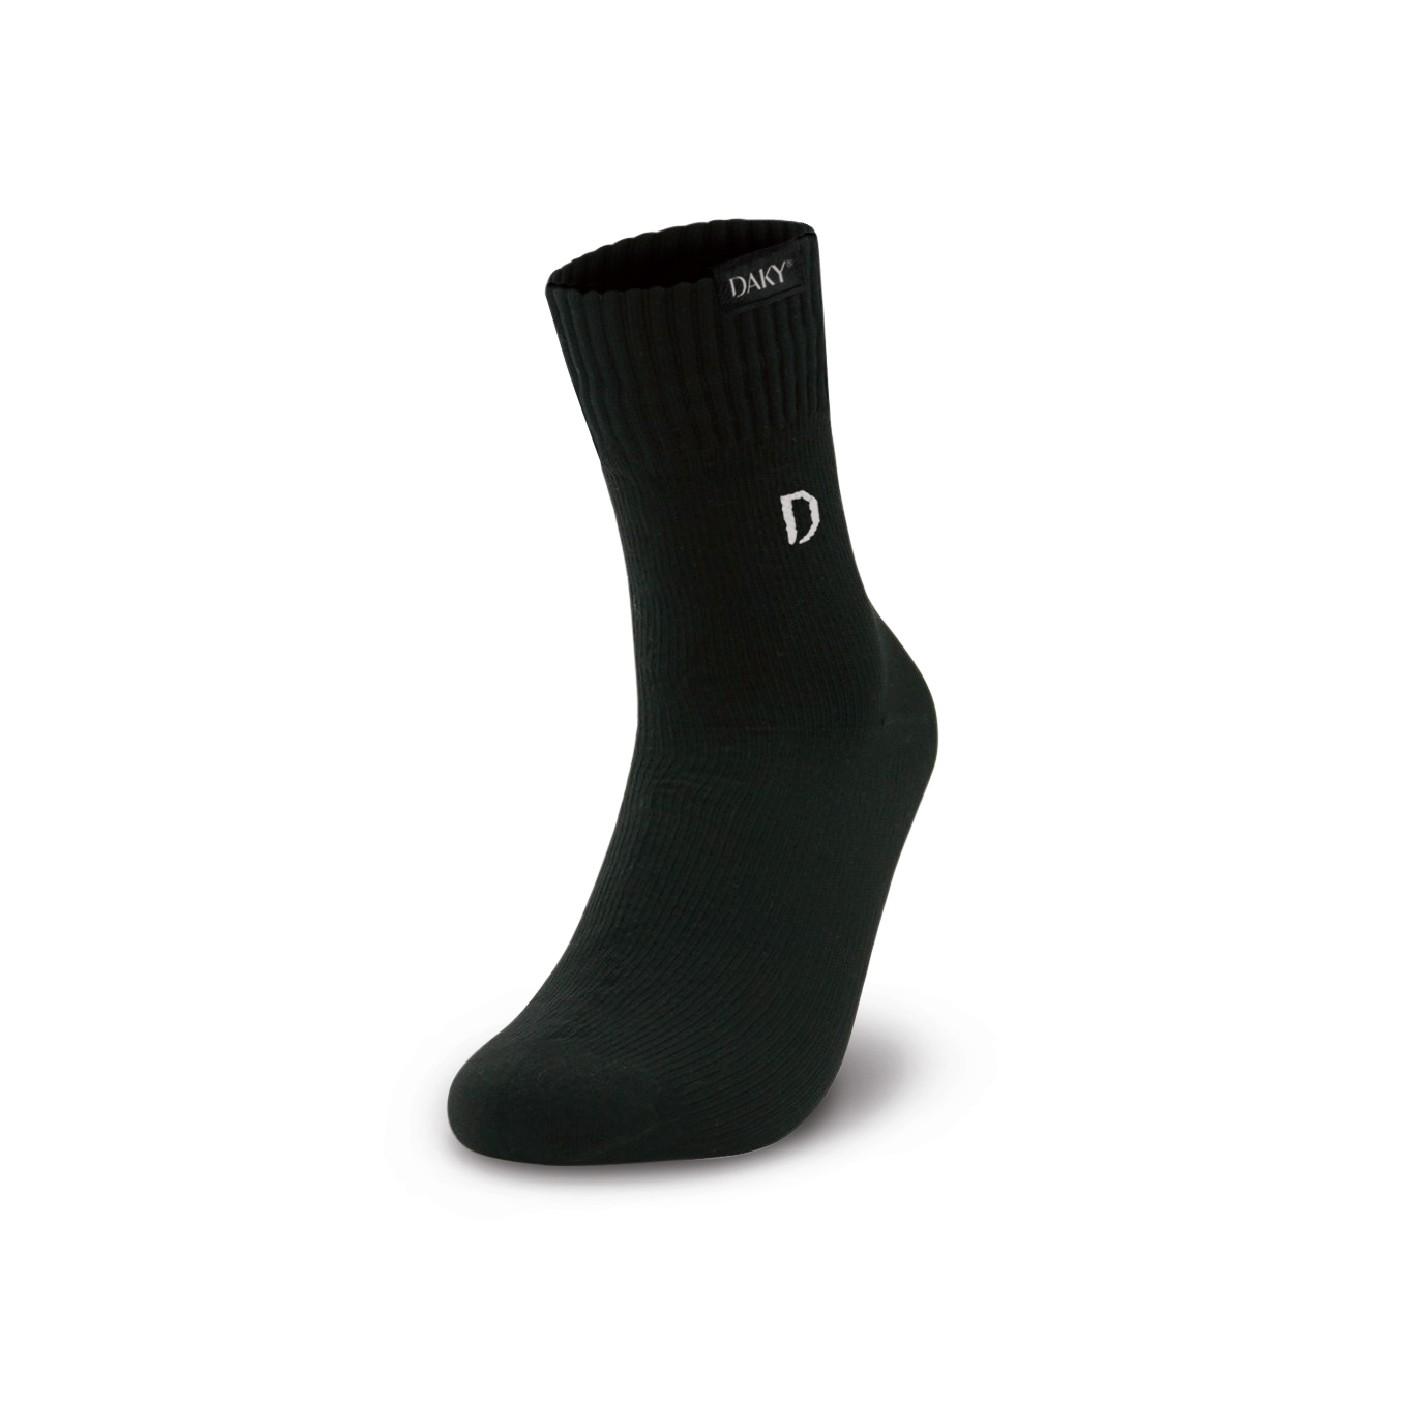 DAKY (PHANTOM X) - WUDU (MASAH) COMPLIANT & WATERPROOF BLACK SOCKS